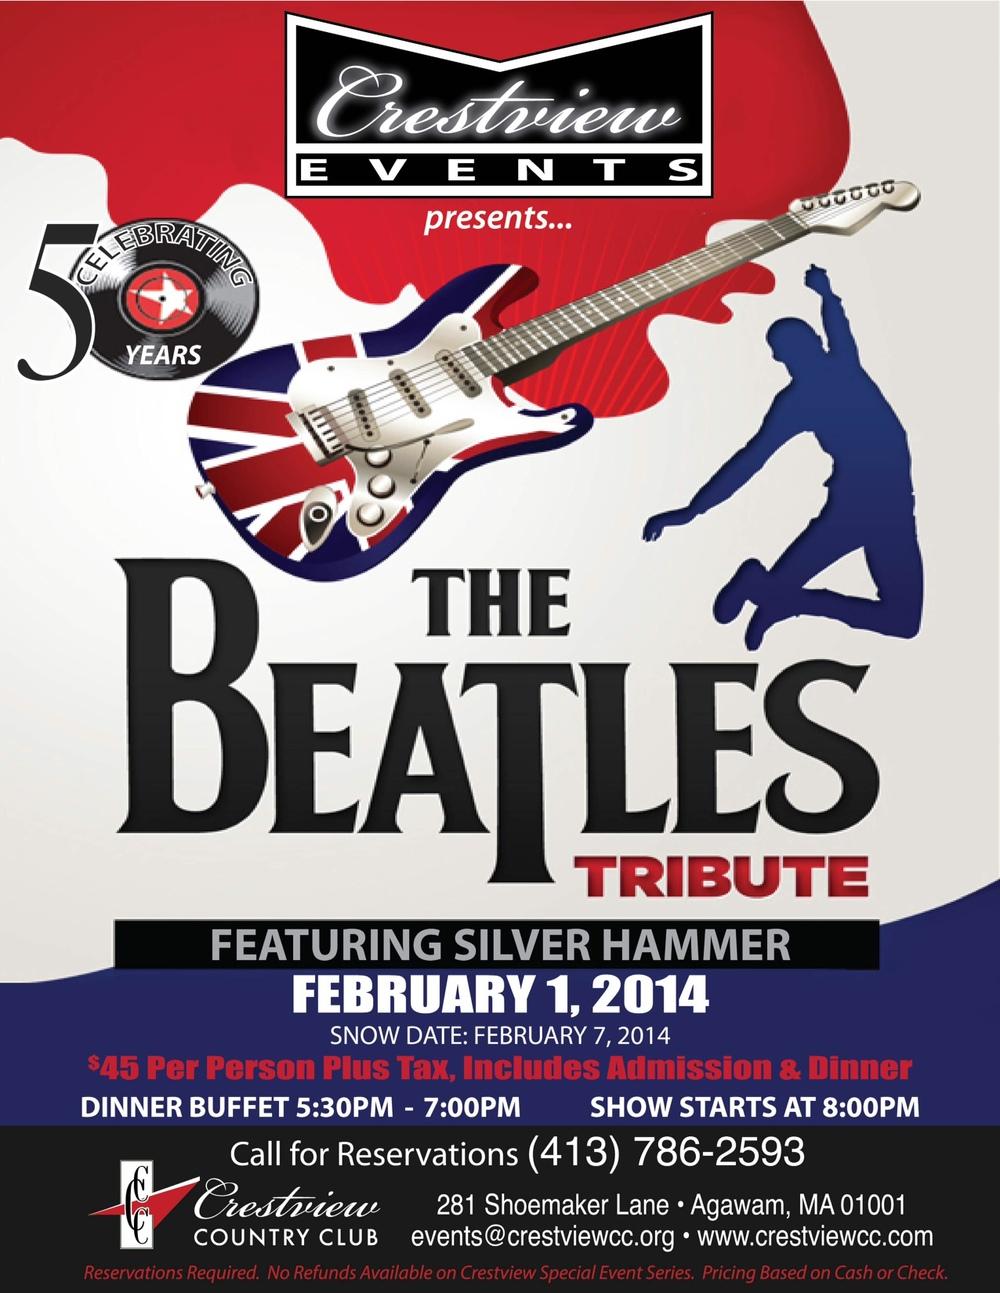 Beatles Final 12-23-13 Small gdl-01.jpg